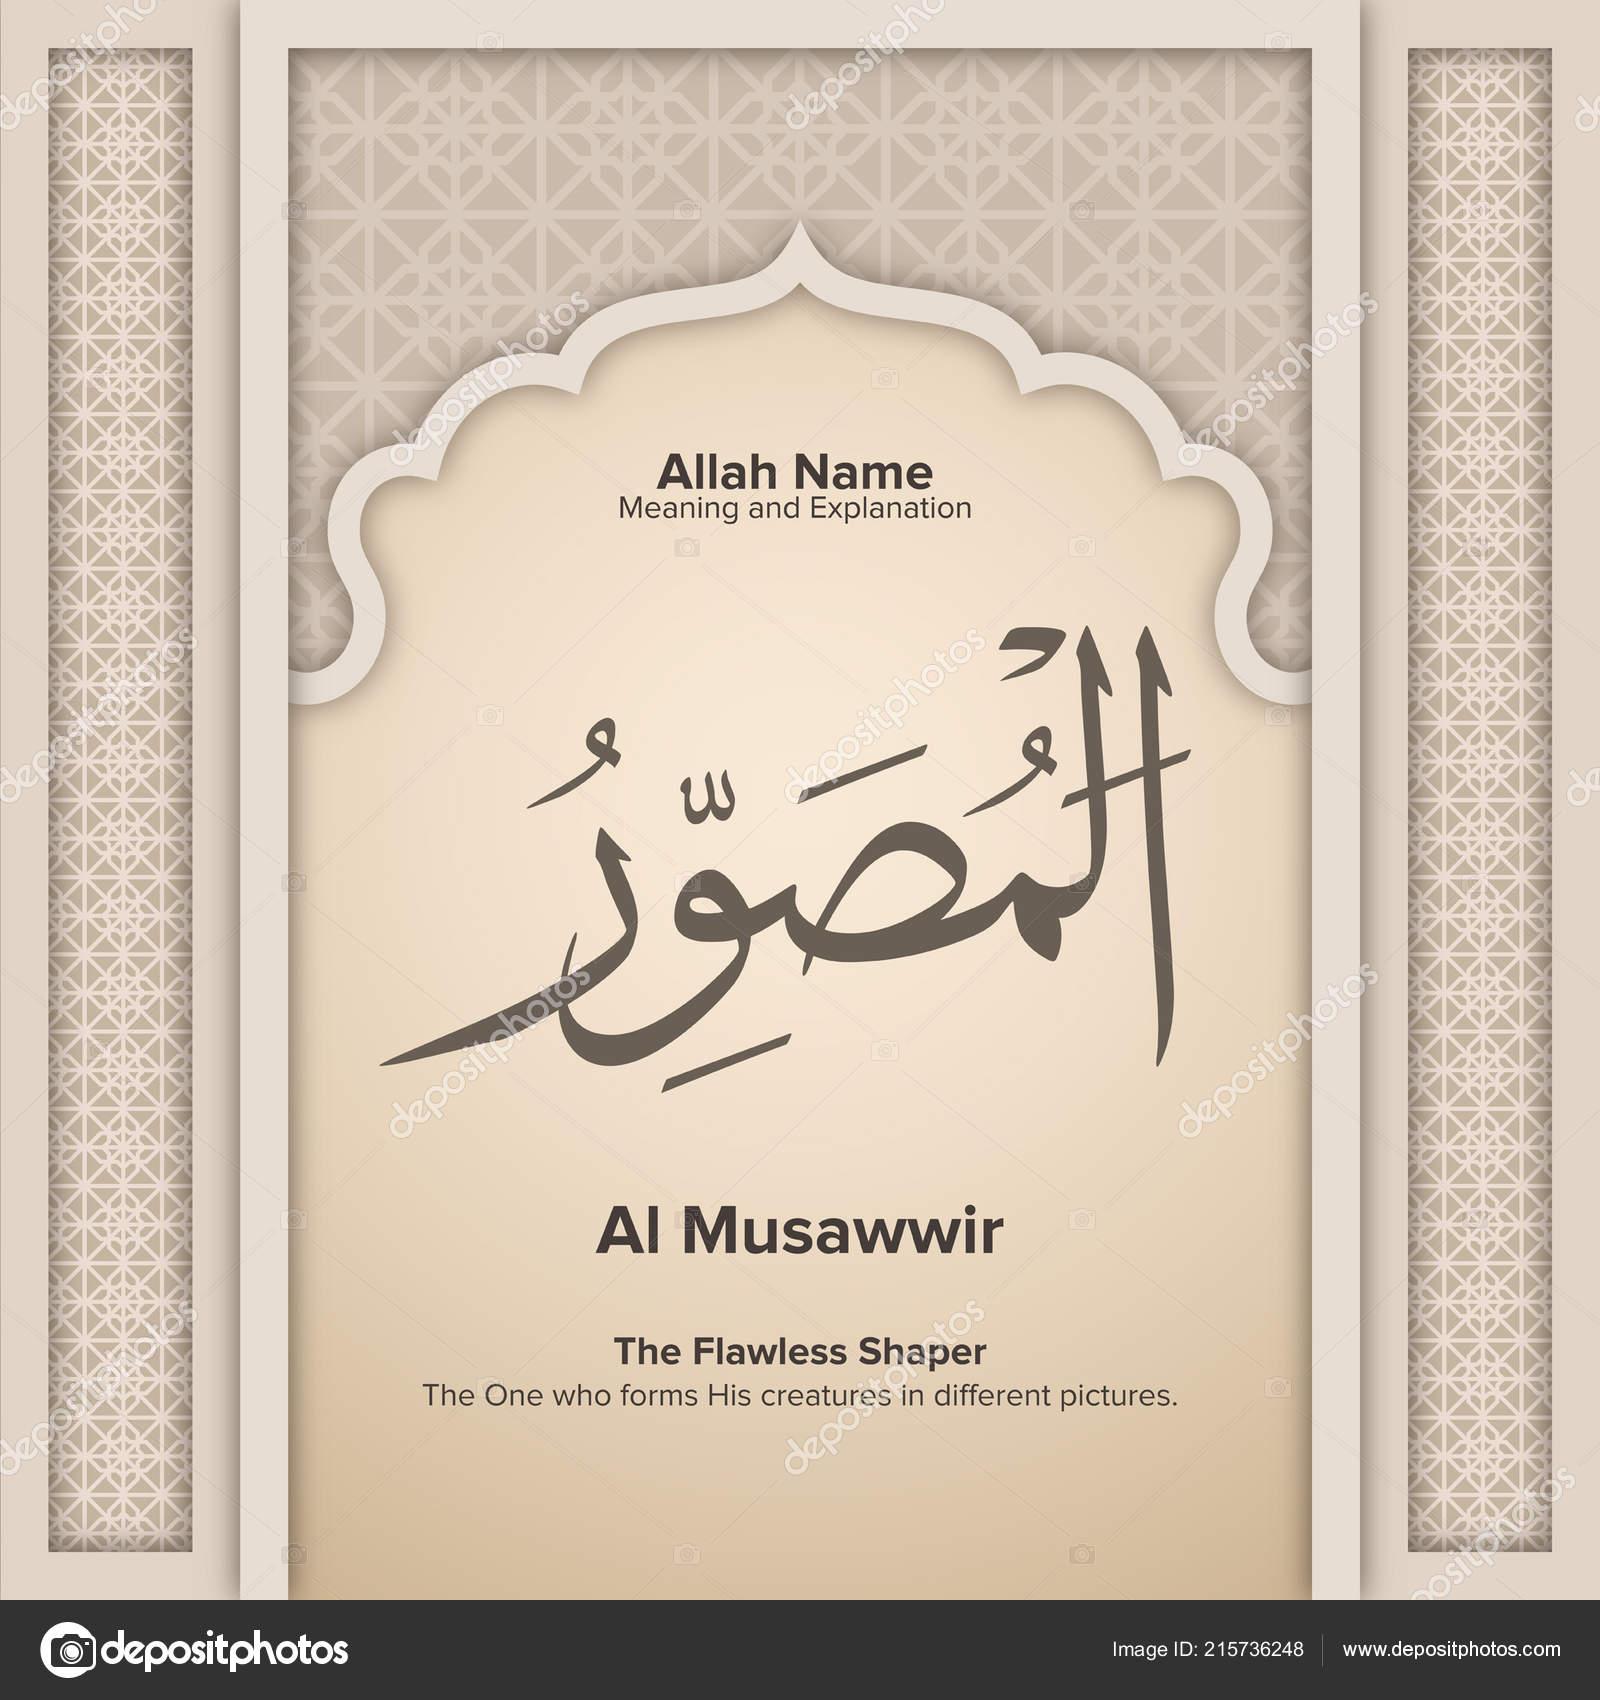 99 Names Of Allah Pdf